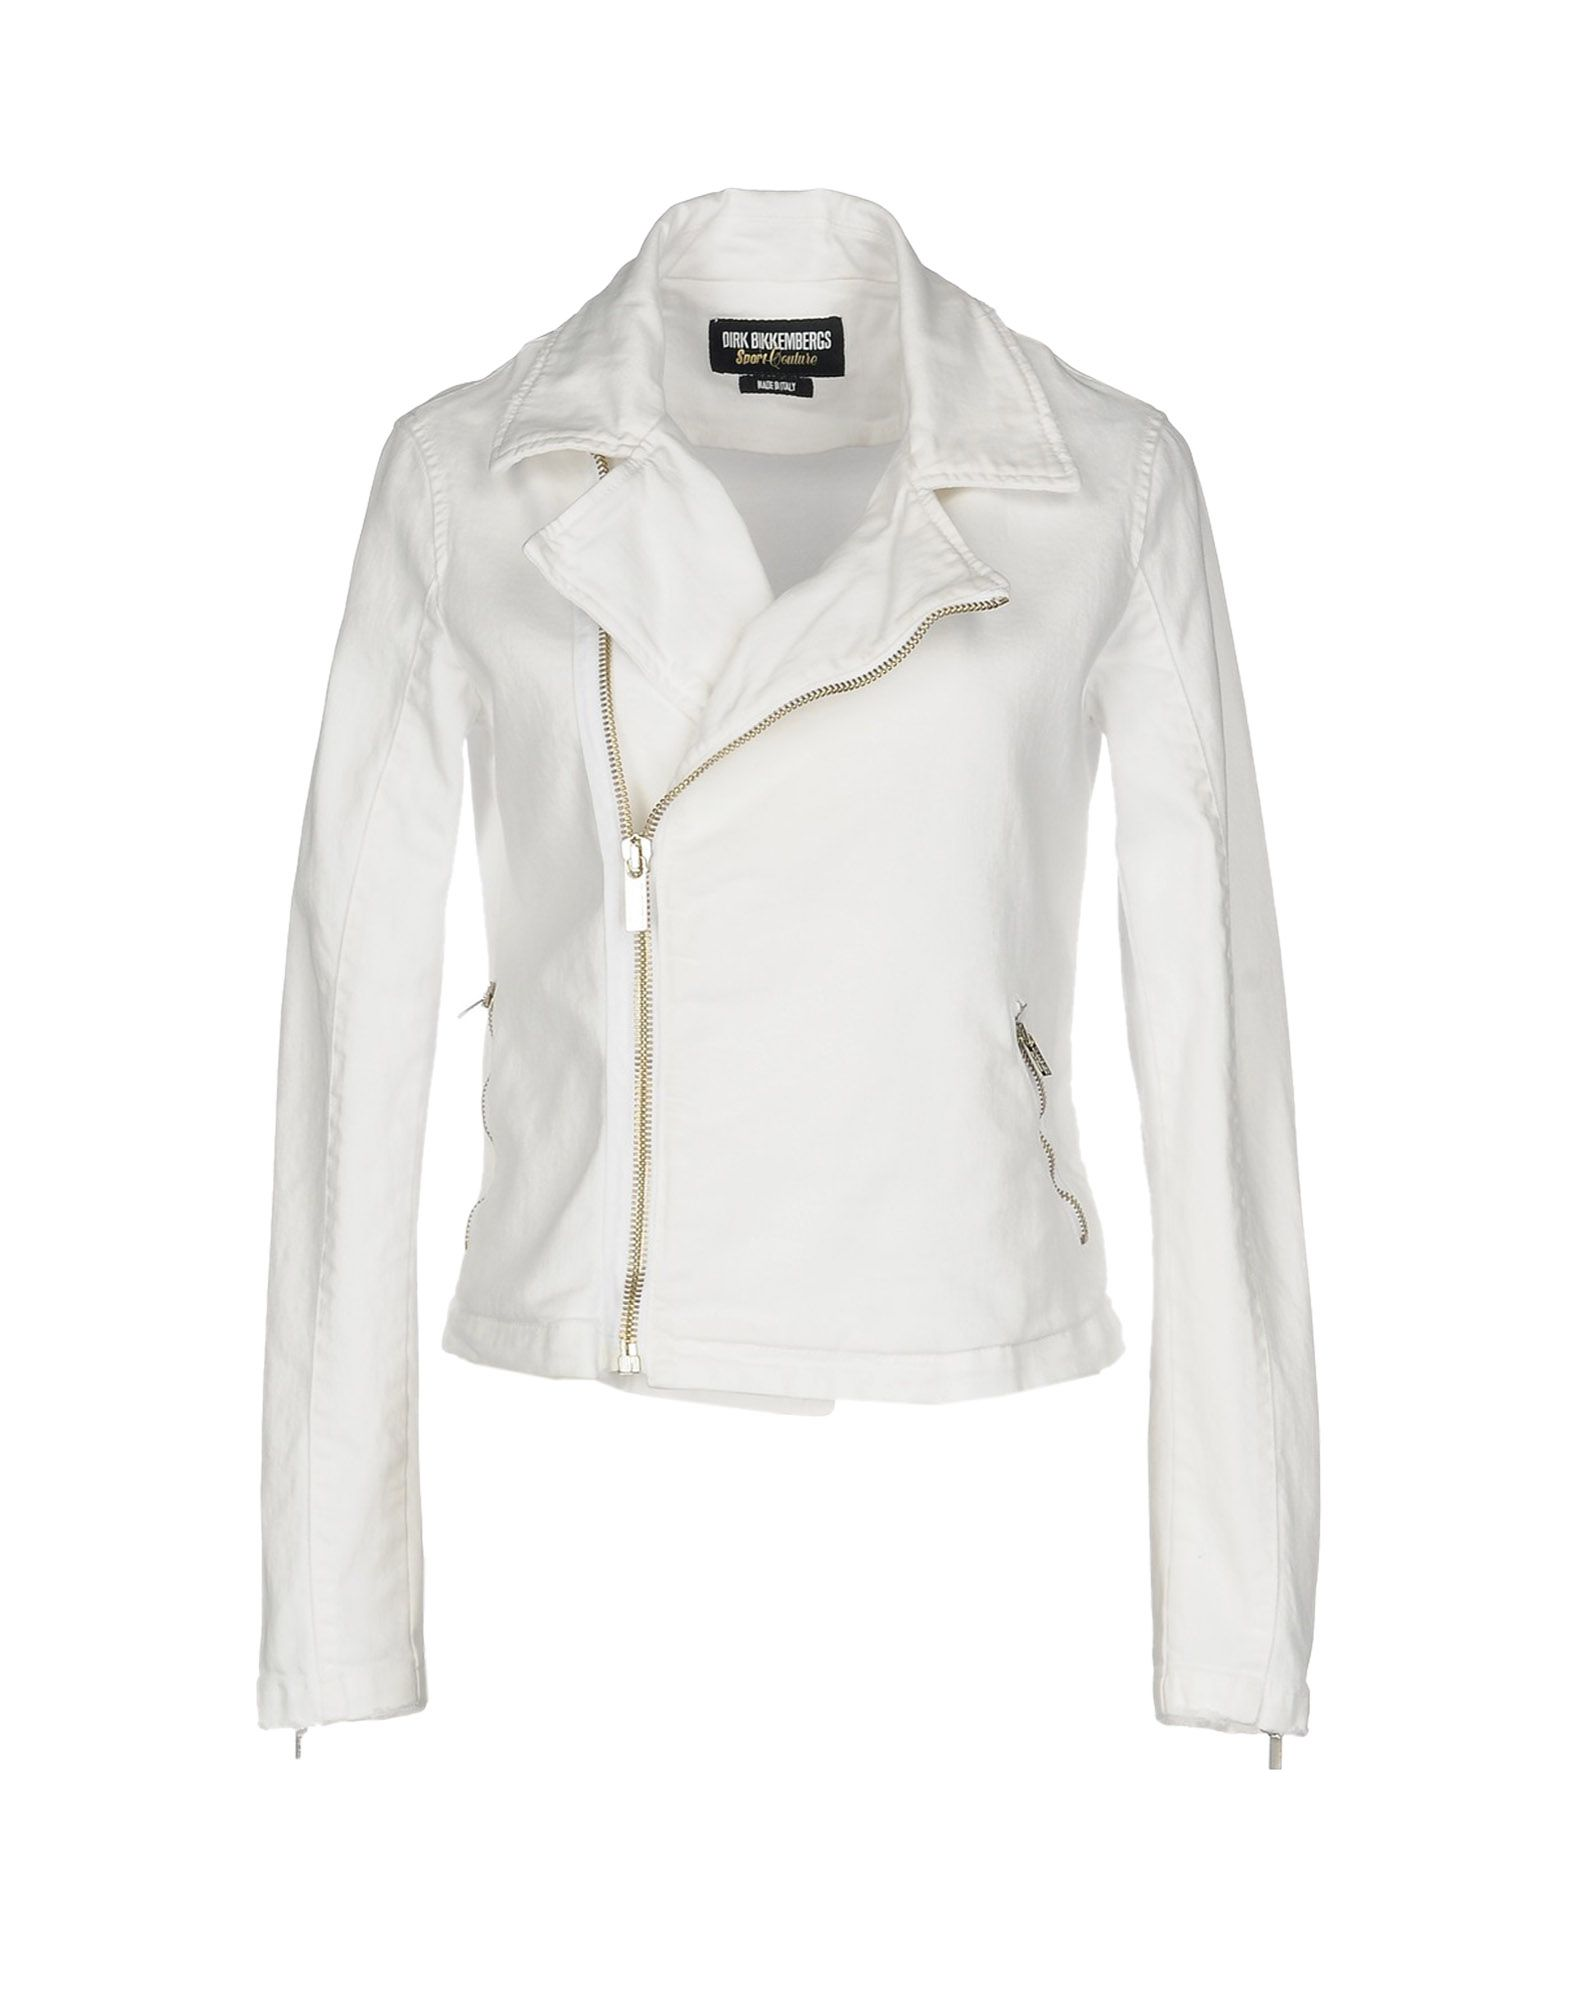 DIRK BIKKEMBERGS SPORT COUTURE Джинсовая верхняя одежда bencivenga couture джинсовая верхняя одежда